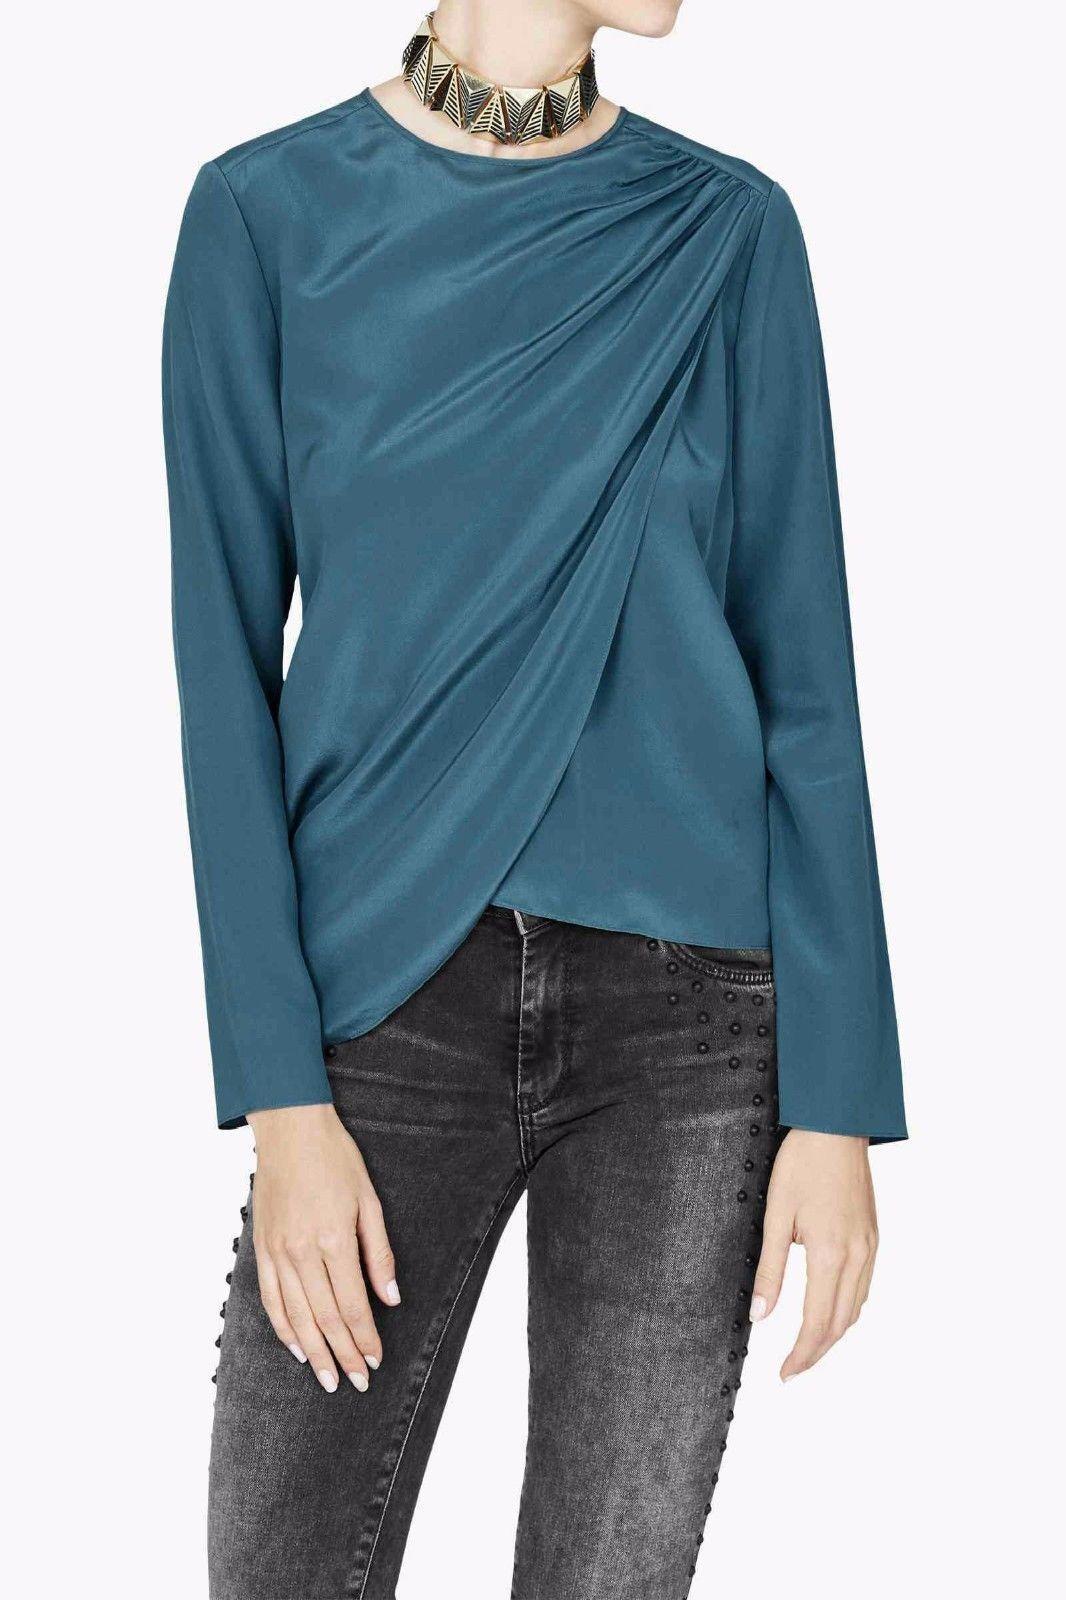 SASS & BIDE Athology Blau Silk Top Draped Blouse Größe 44 US 10  Celeb FAV